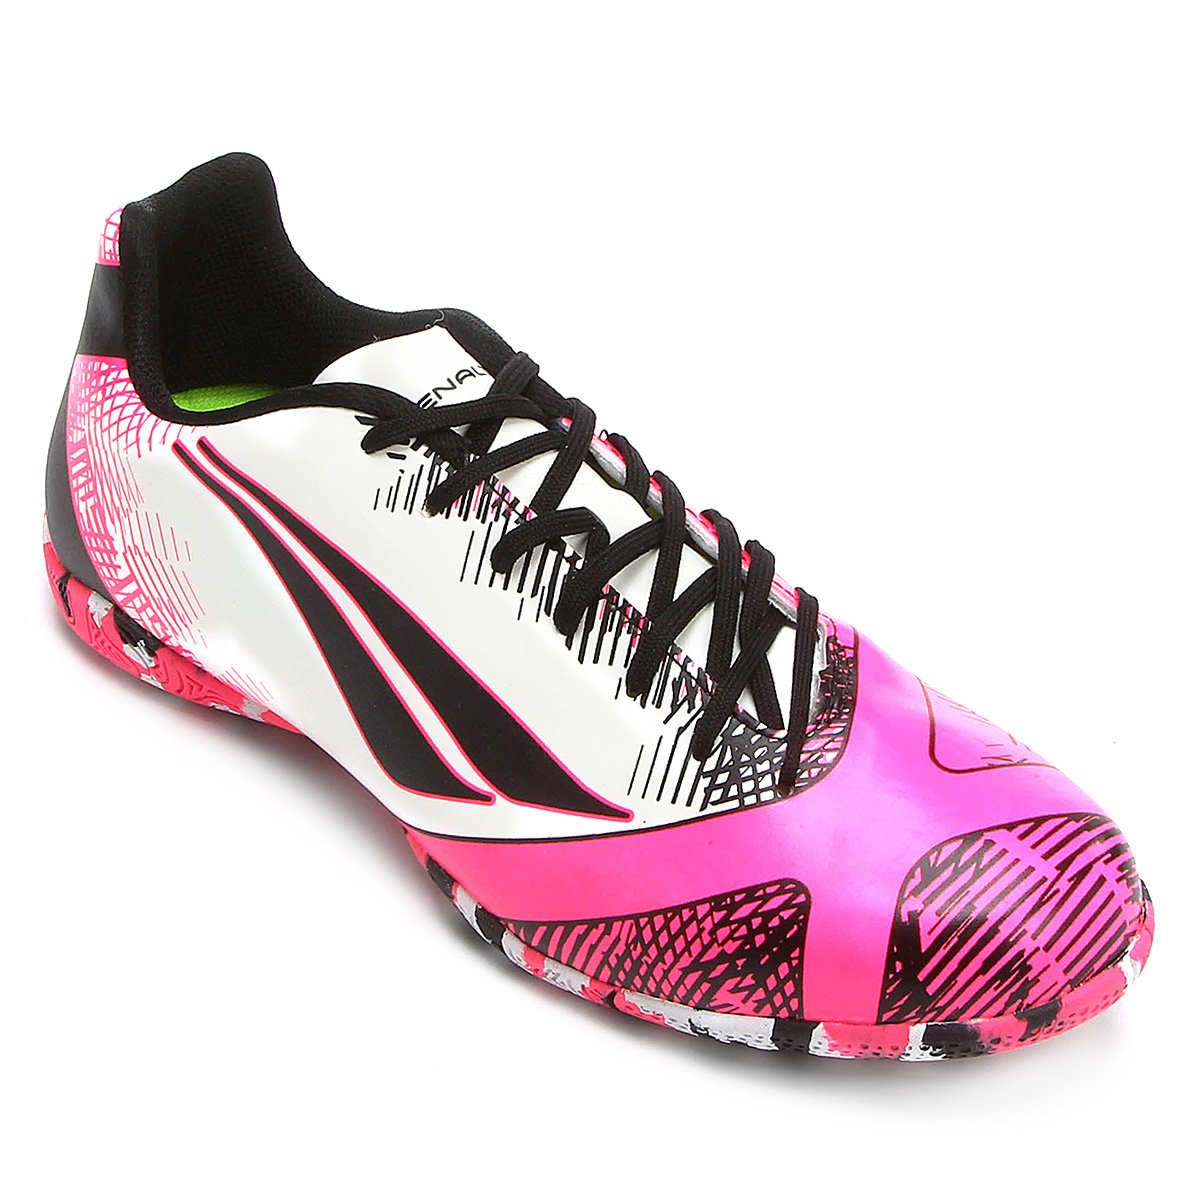 ... Chuteira Futsal Penalty Victoria RX 2 VI Compre Agora Netshoes 4d651bce9a2f3